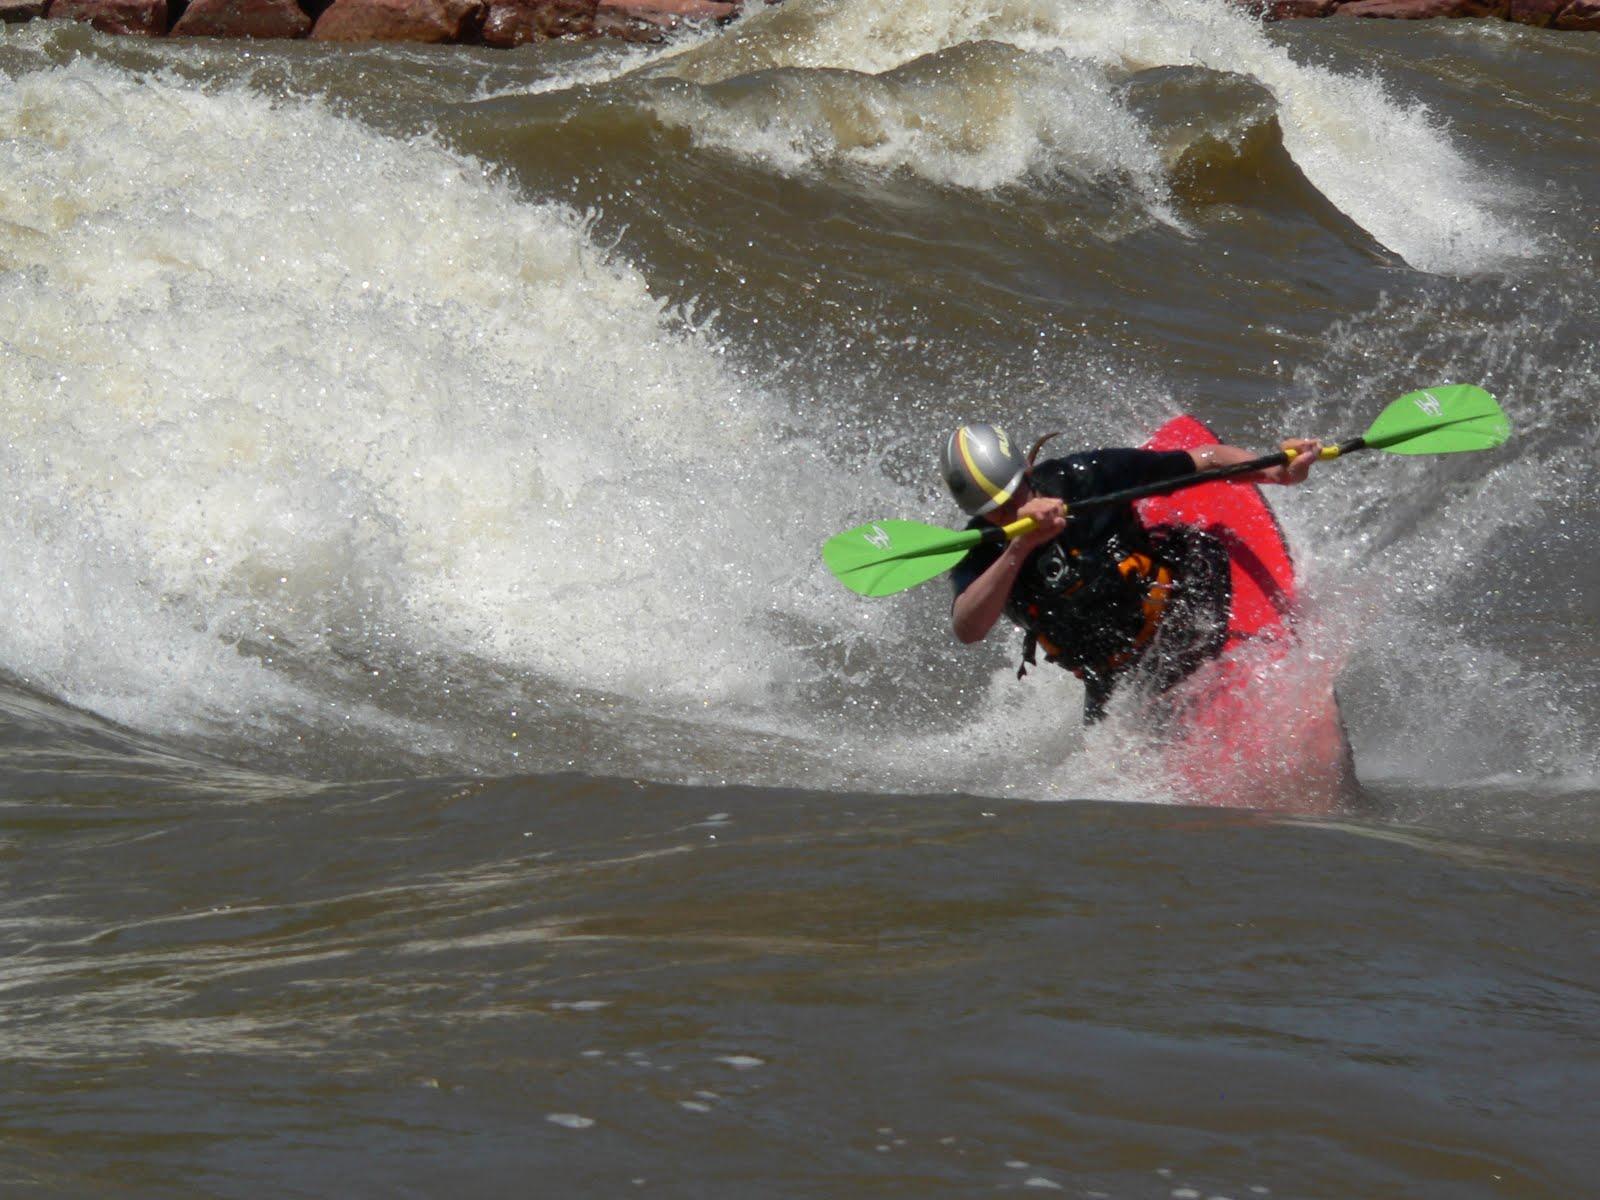 Big smiles big sur and glenwood waves colorado kayak for Big sur fishing